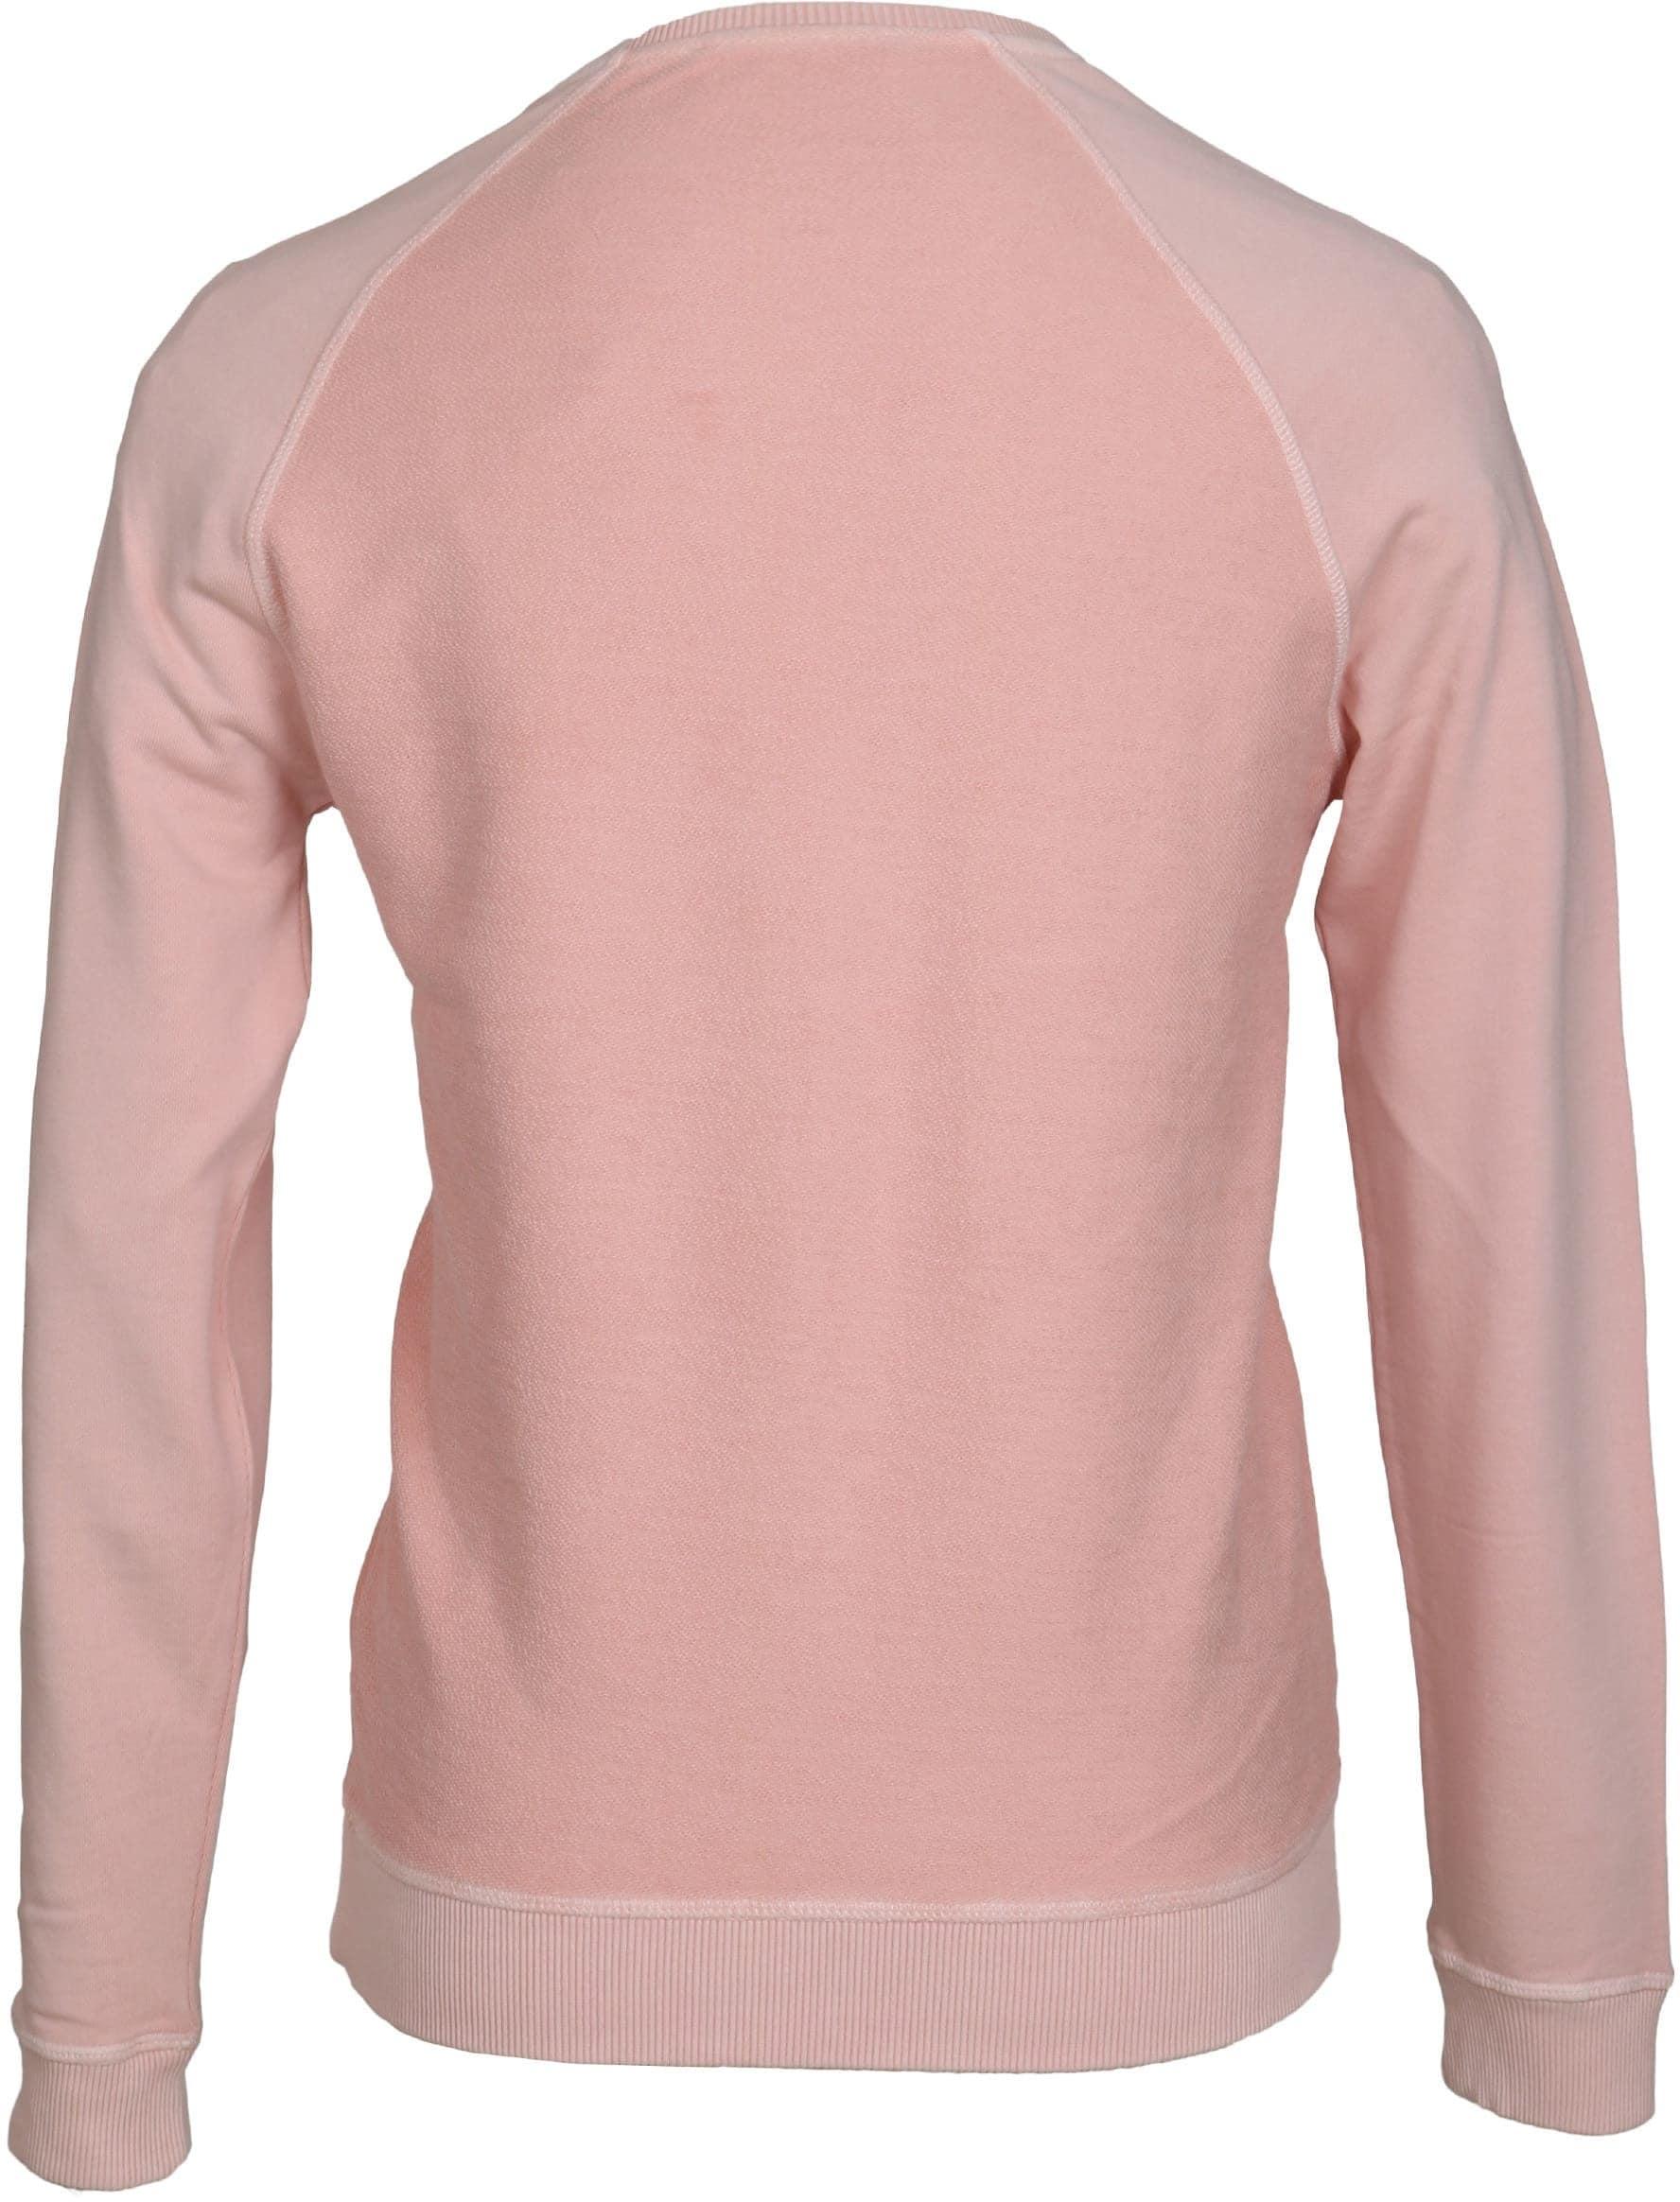 New In Town Sweater Roze foto 3